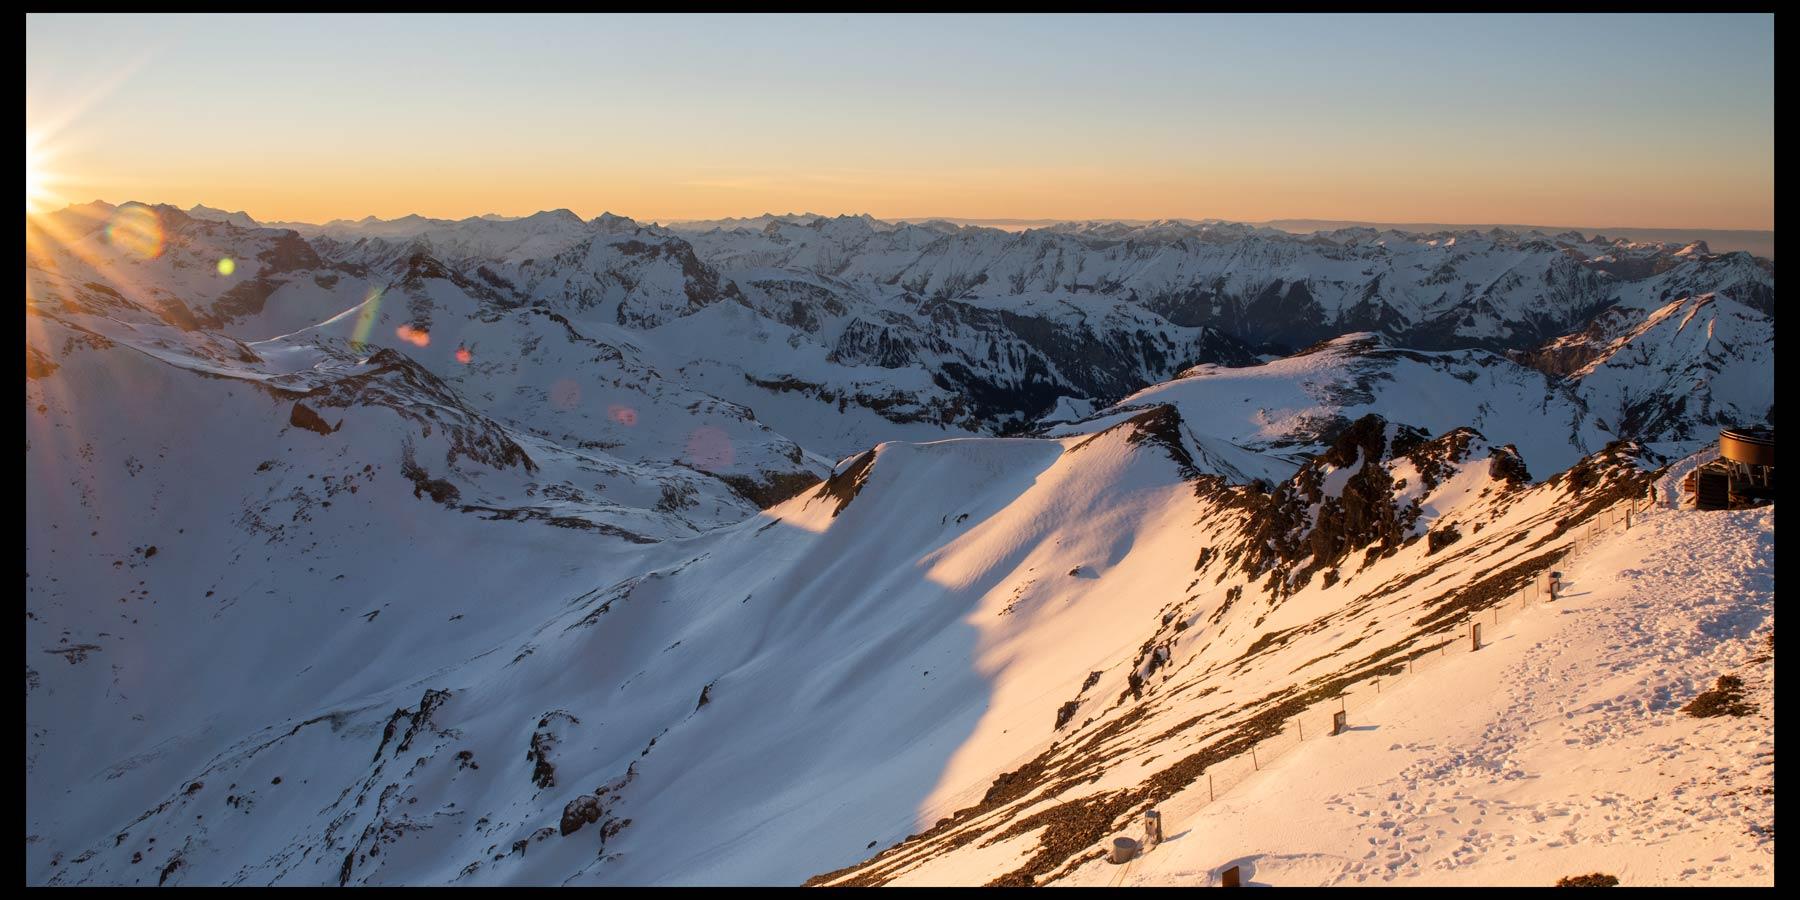 skiing-the-schilthorn